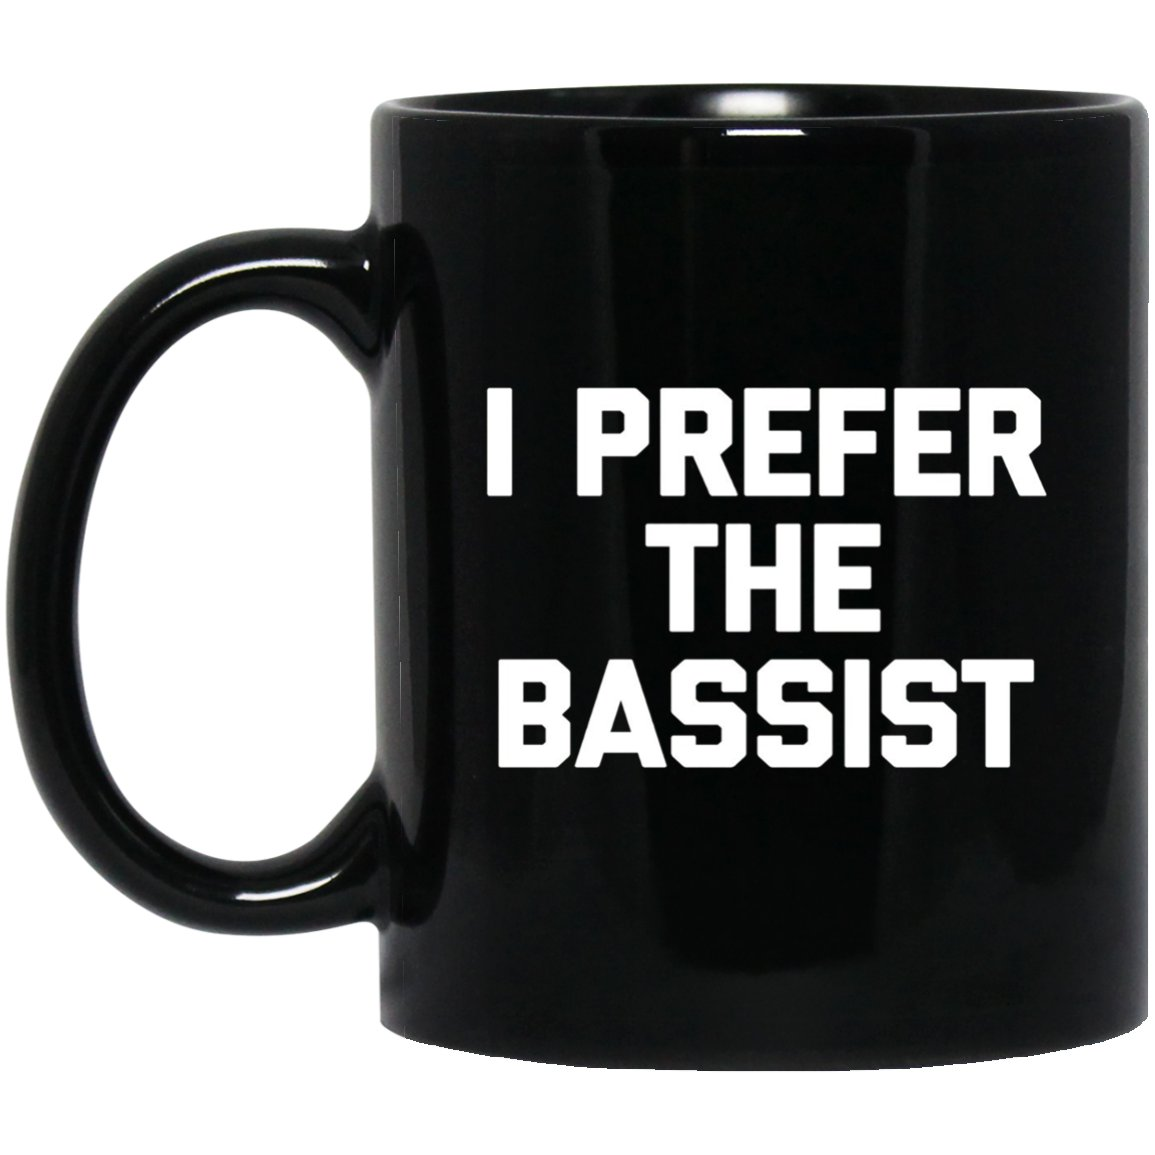 I Prefer The Bassist funny saying bass player humor Black  Mug Black Ceramic 11oz Coffee Tea Cup